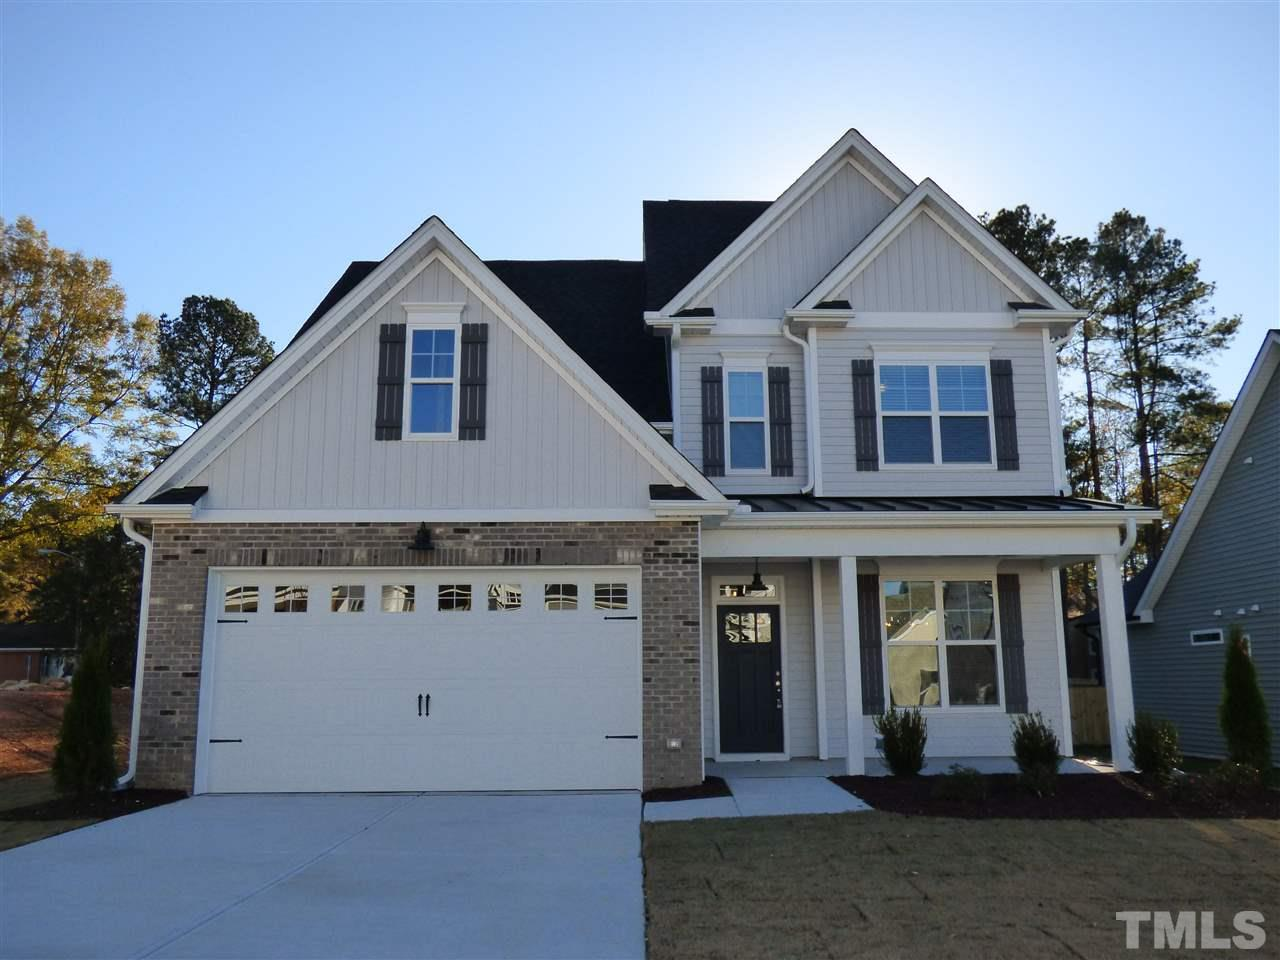 353 Joyner Bluff Drive, The Bluffs at Joyner Park, Wake Forest NC (Homesite 7) - $362,043